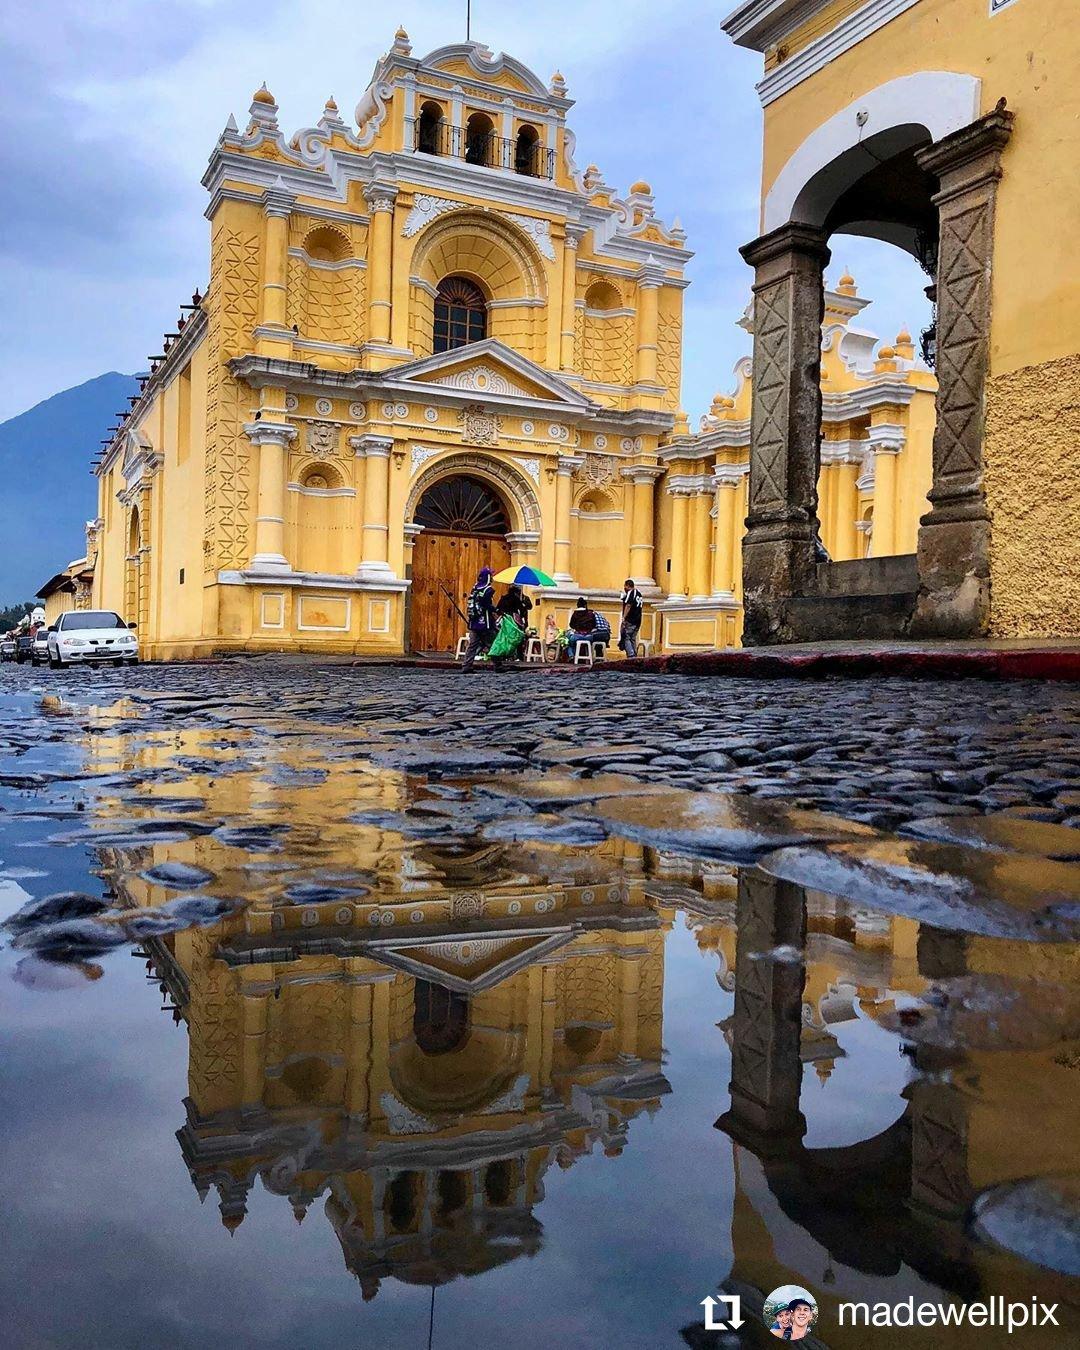 Nuestra Iglesia de San Pedro.  Foto 📸 Zach  #AntiguaGuatemala #Guatemala #Travel #Fotografía https://t.co/1VzsKScBY0